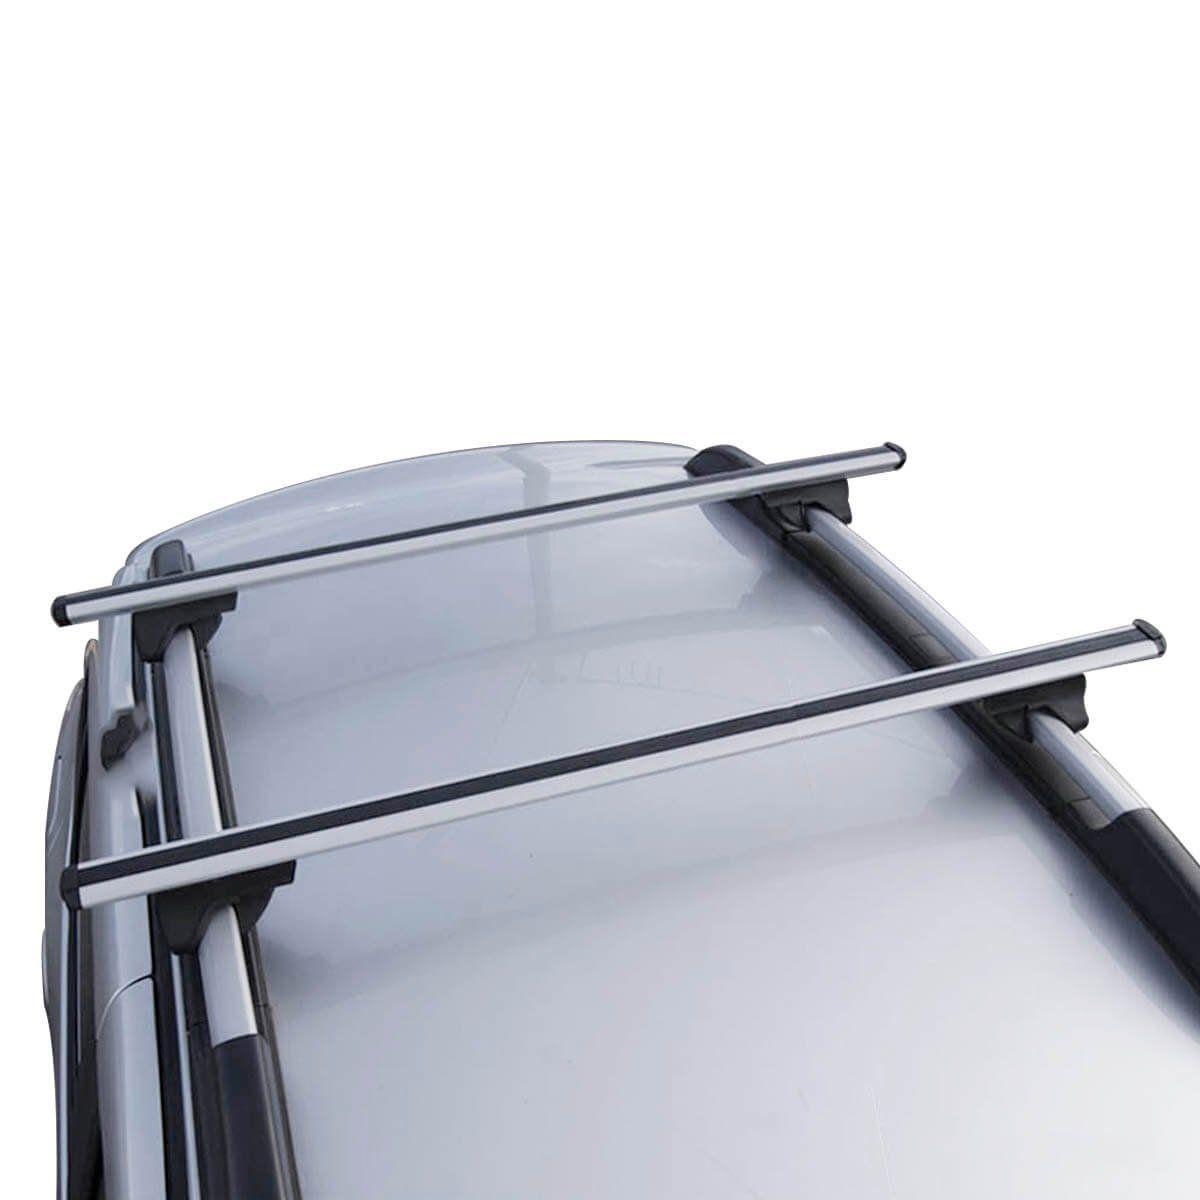 Travessa rack de teto Bepo Eros prata Peugeot 206 SW 207 SW 207 Escapade 307 SW